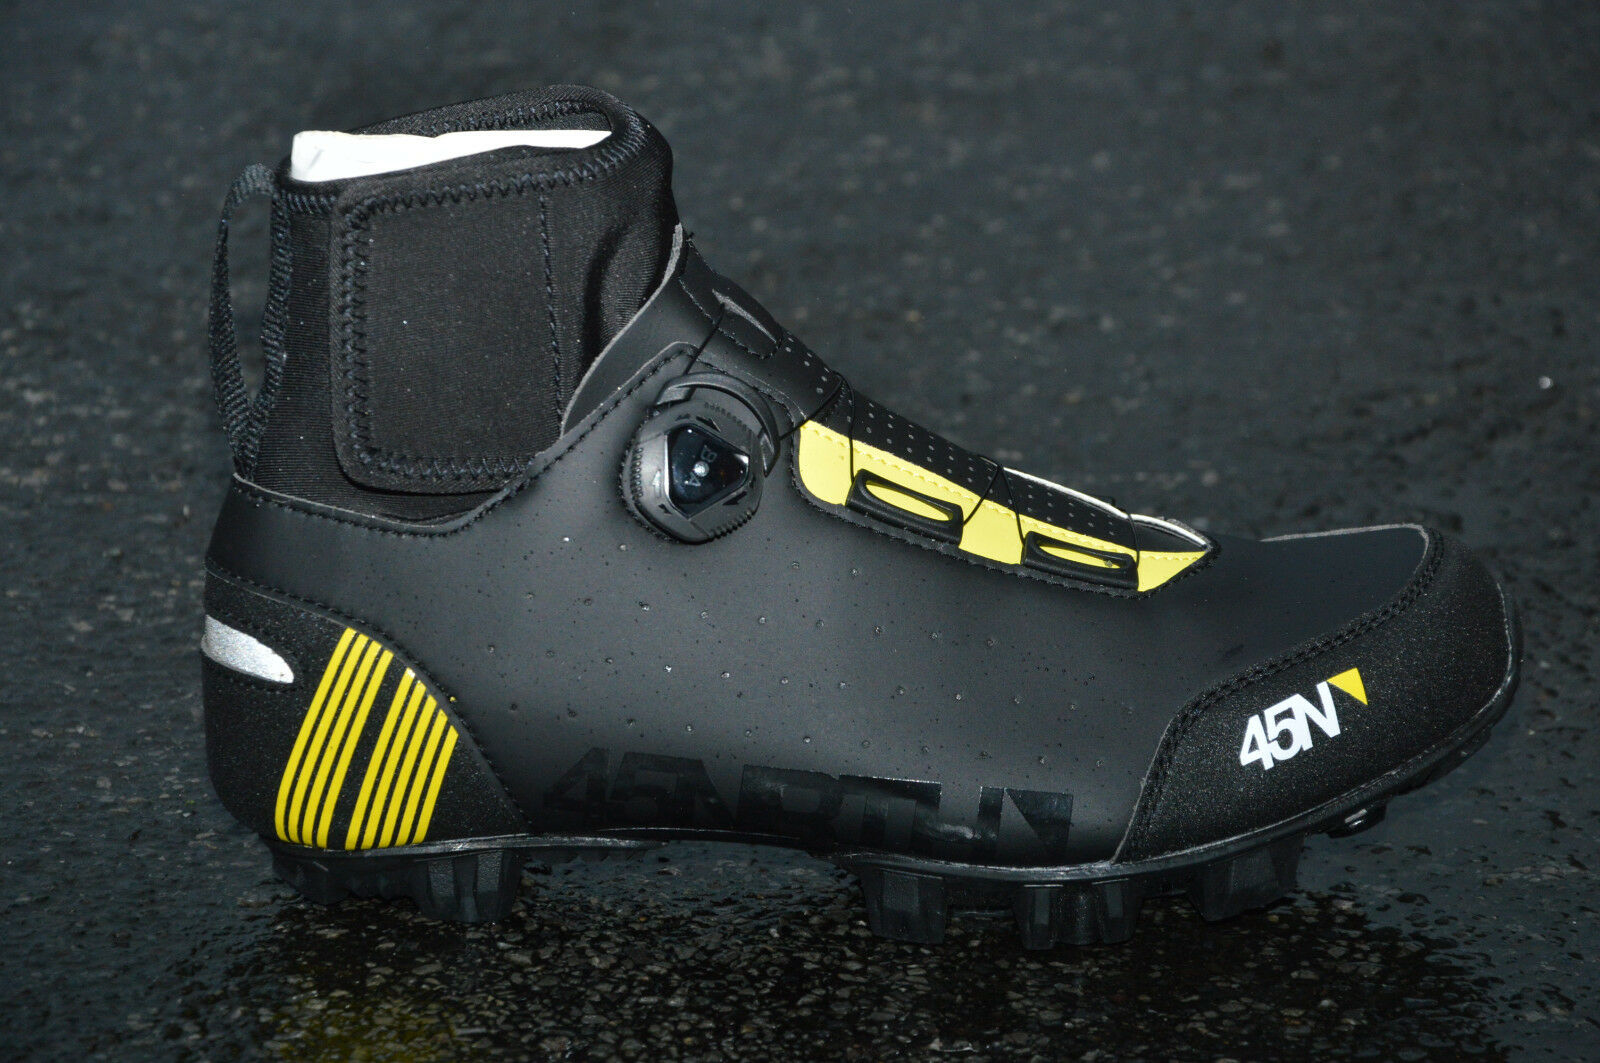 45 NRTH Ragnarok invierno-zapatos MTB cálido impermeable boa negra amarilla 2019